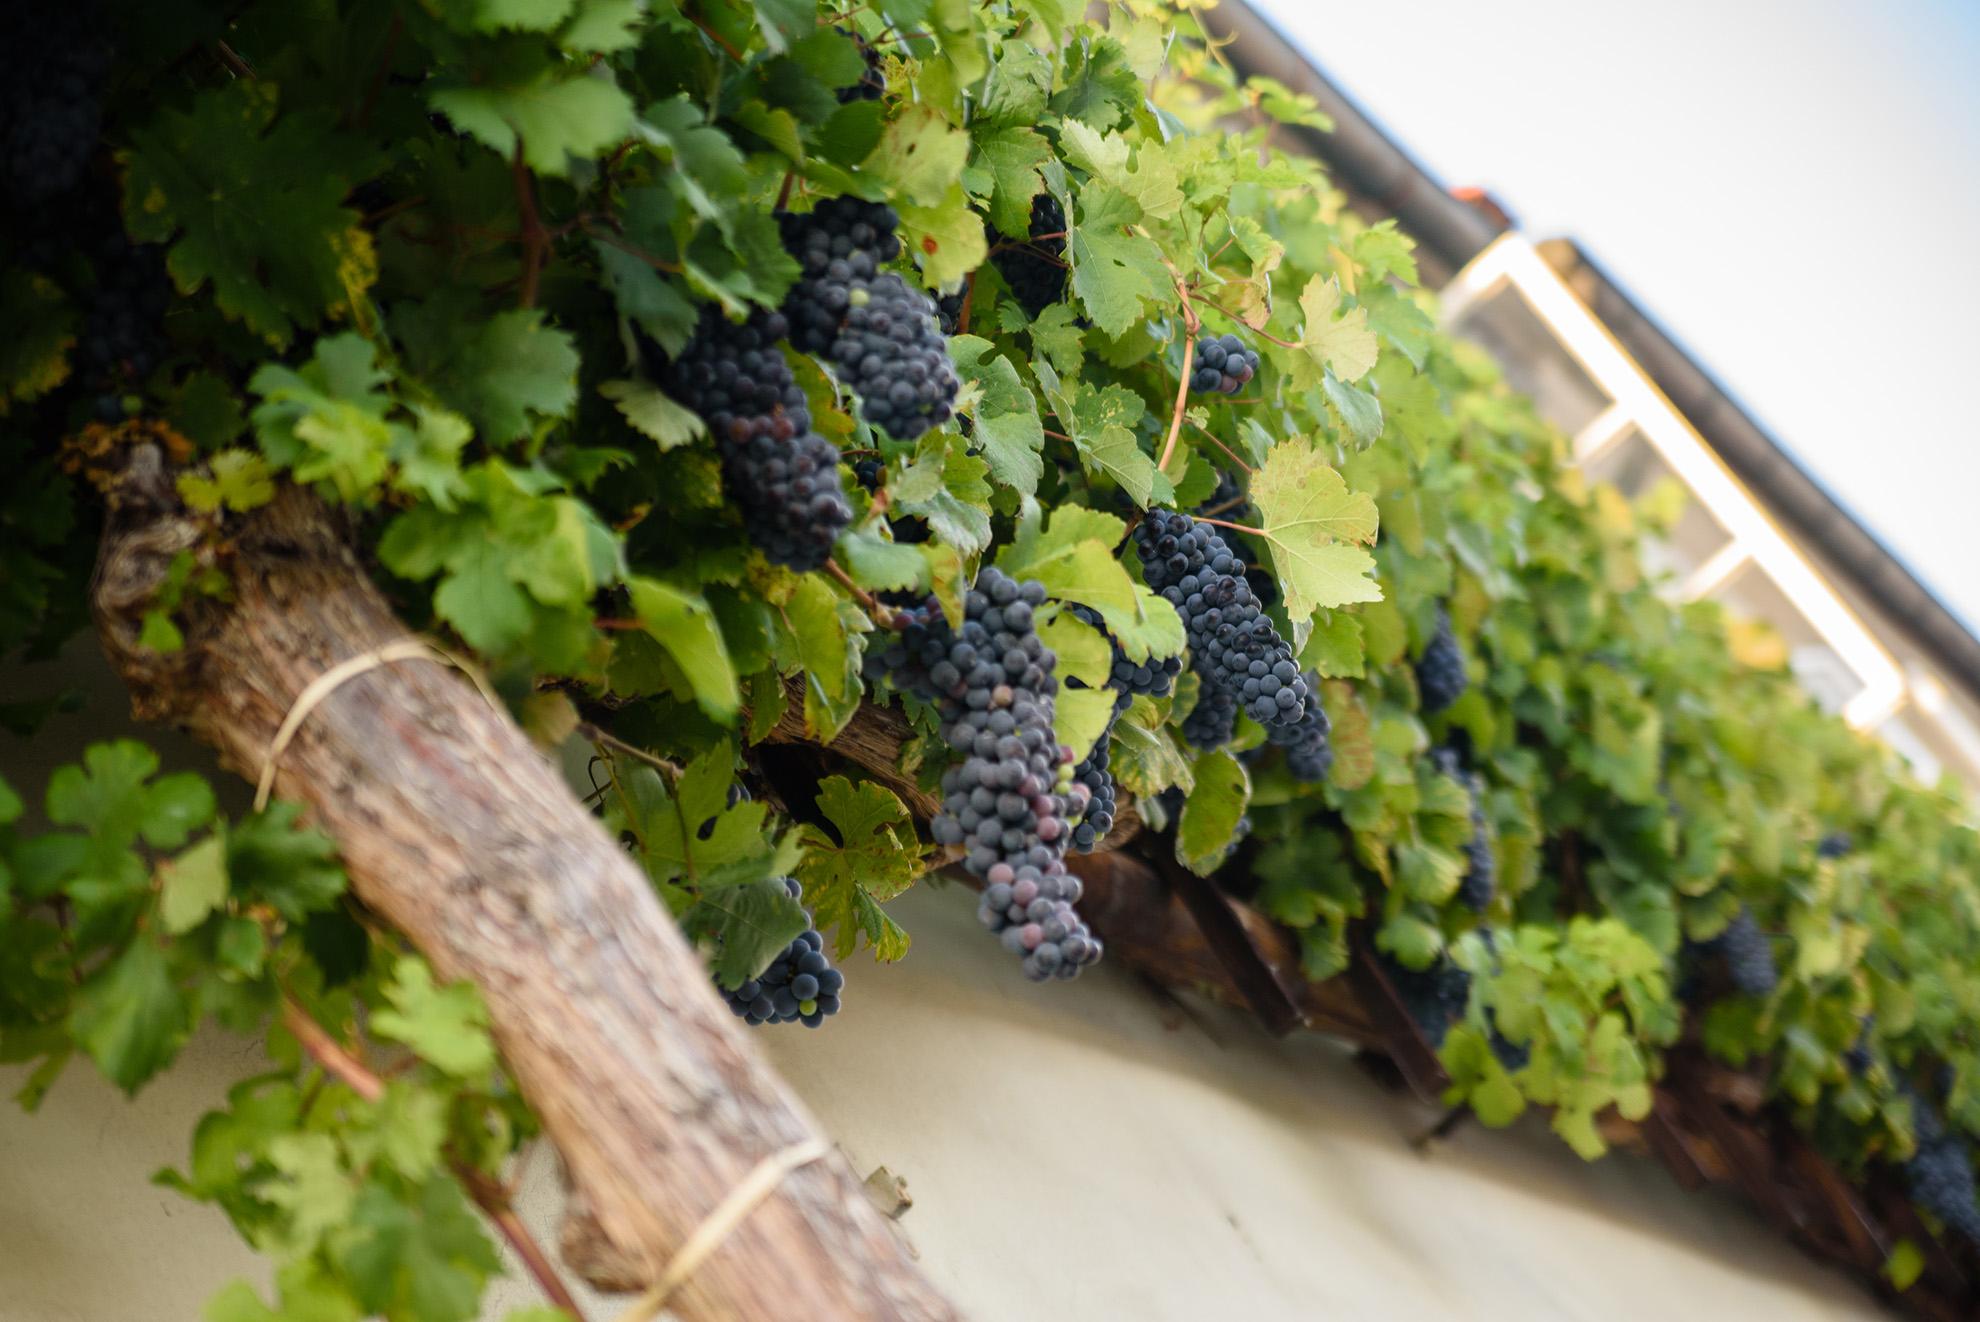 Stara trta co roku oddaje 35-50kg winogron